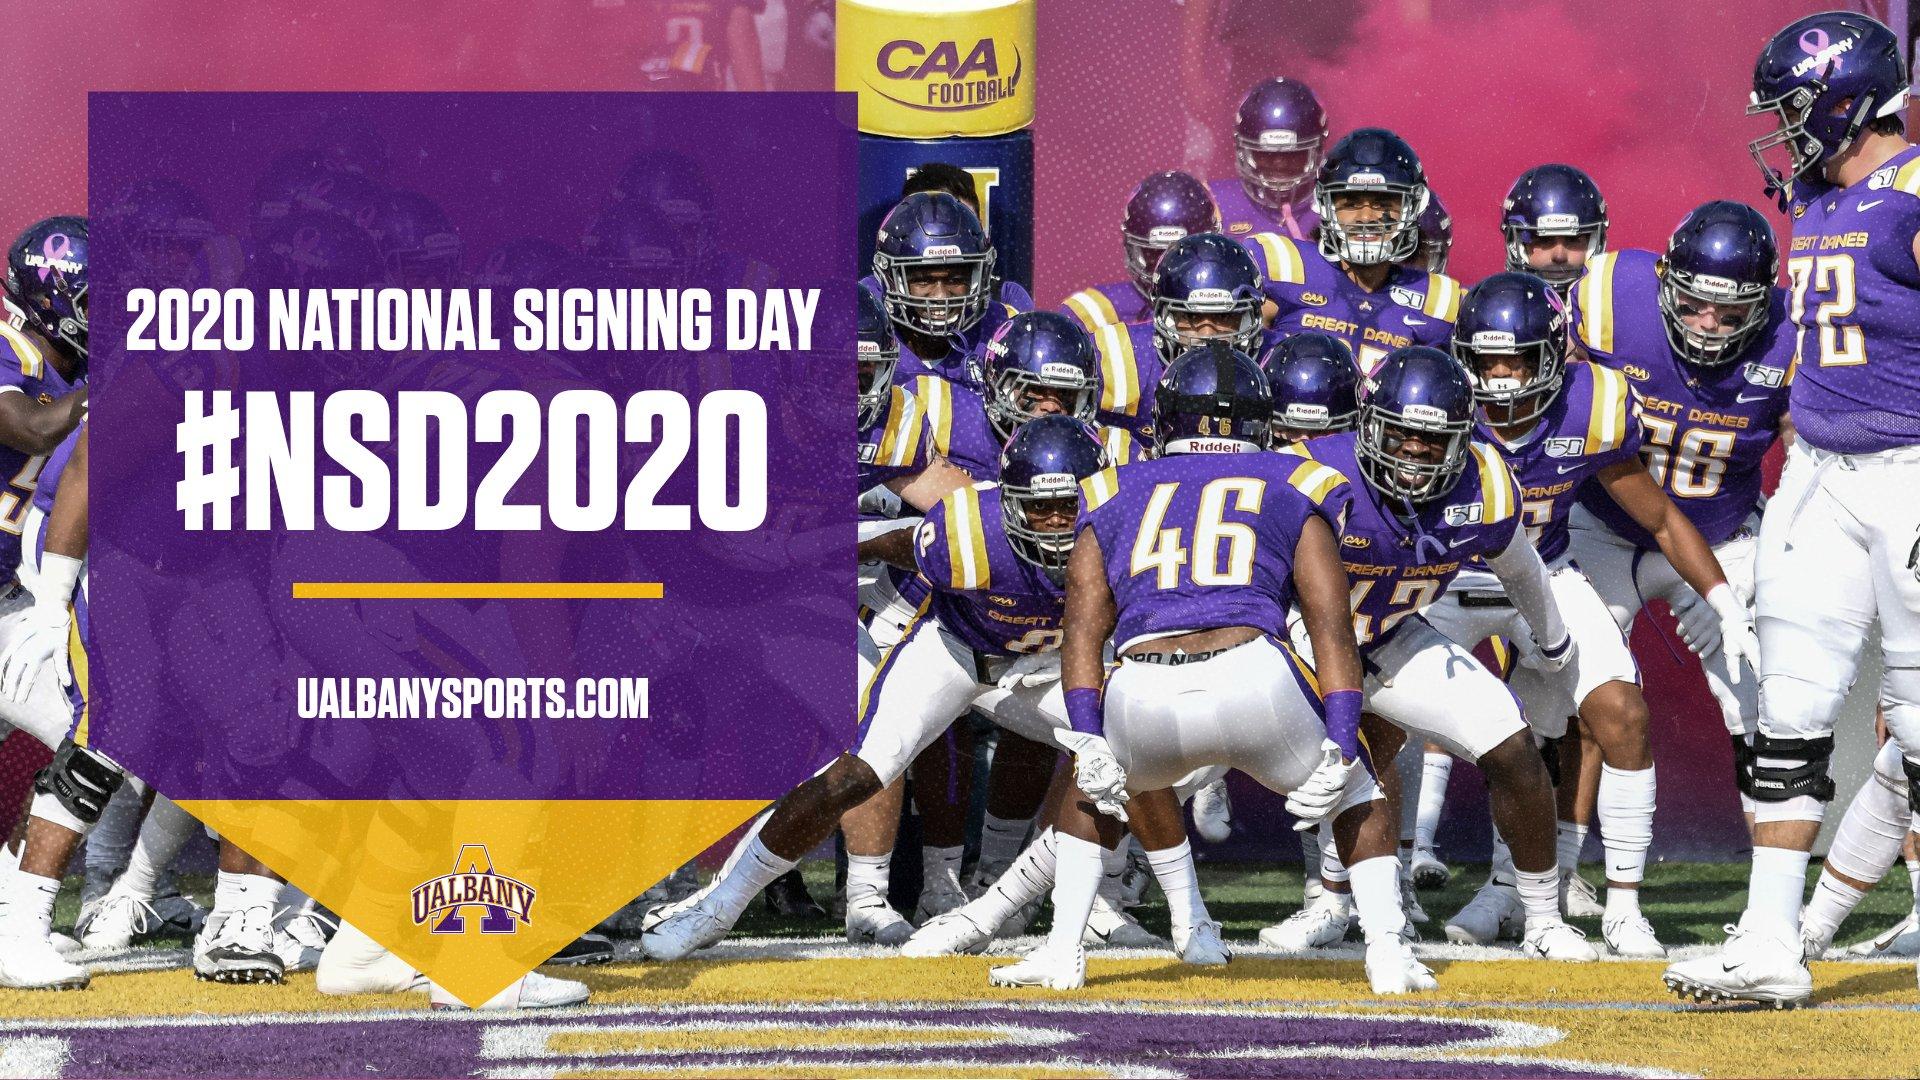 2020 UAlbany Football National Signing Day   University at Albany 1920x1080